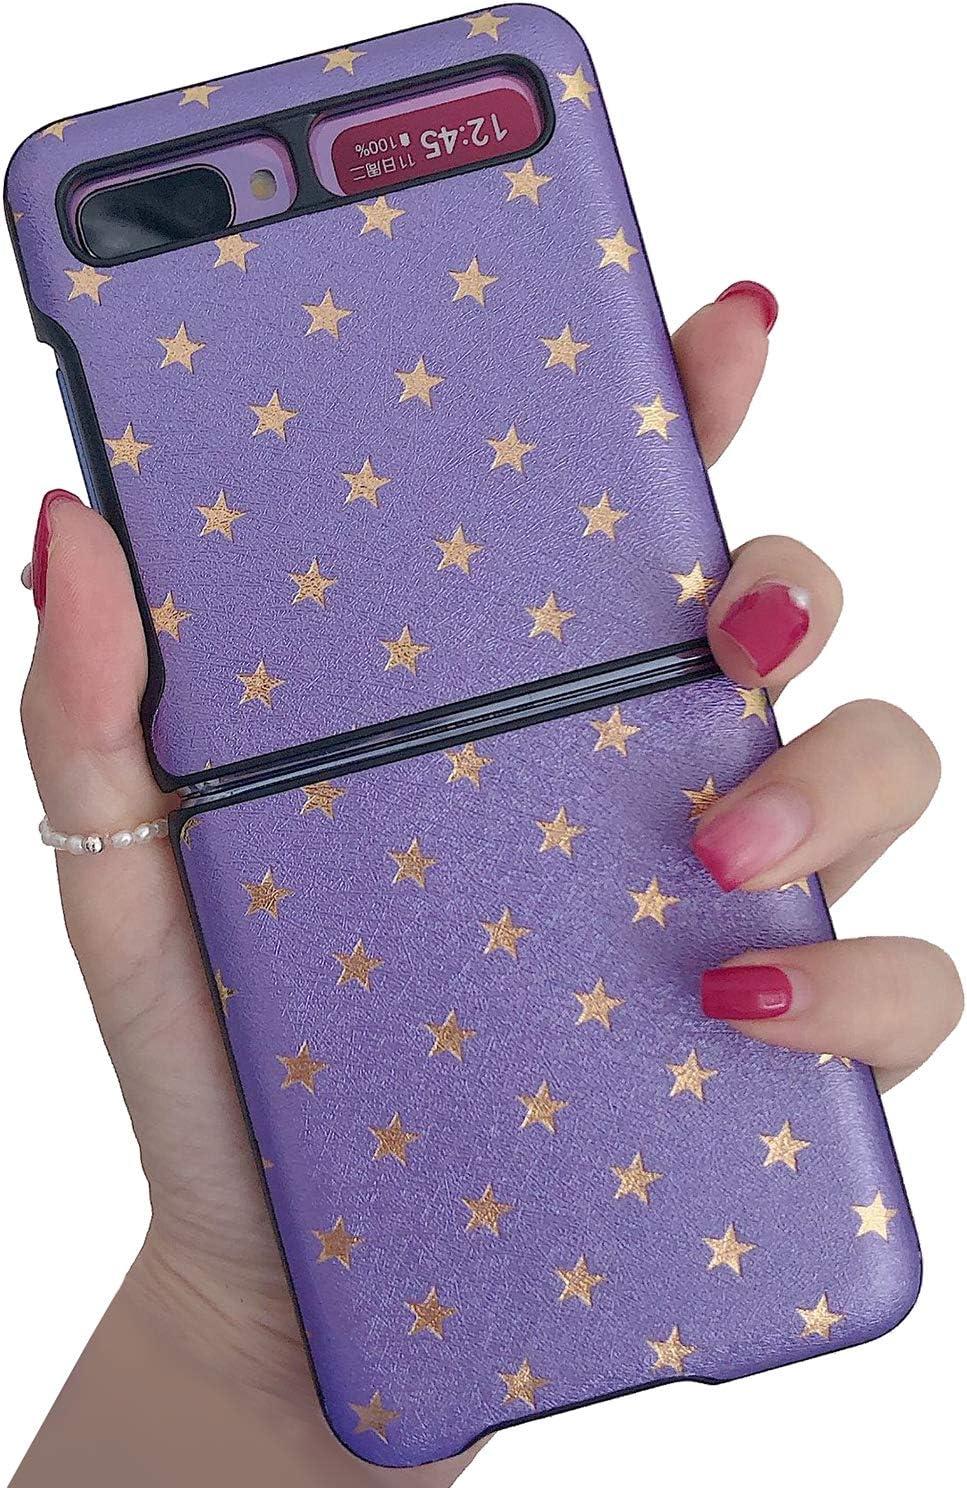 EZICOK Leather Case for Samsung Galaxy Z Flip 5G Case Cover Minimalist Ultra Thin Slim Durable Protective Phone Cases for Samsung Galaxy Z Flip - Purple Star